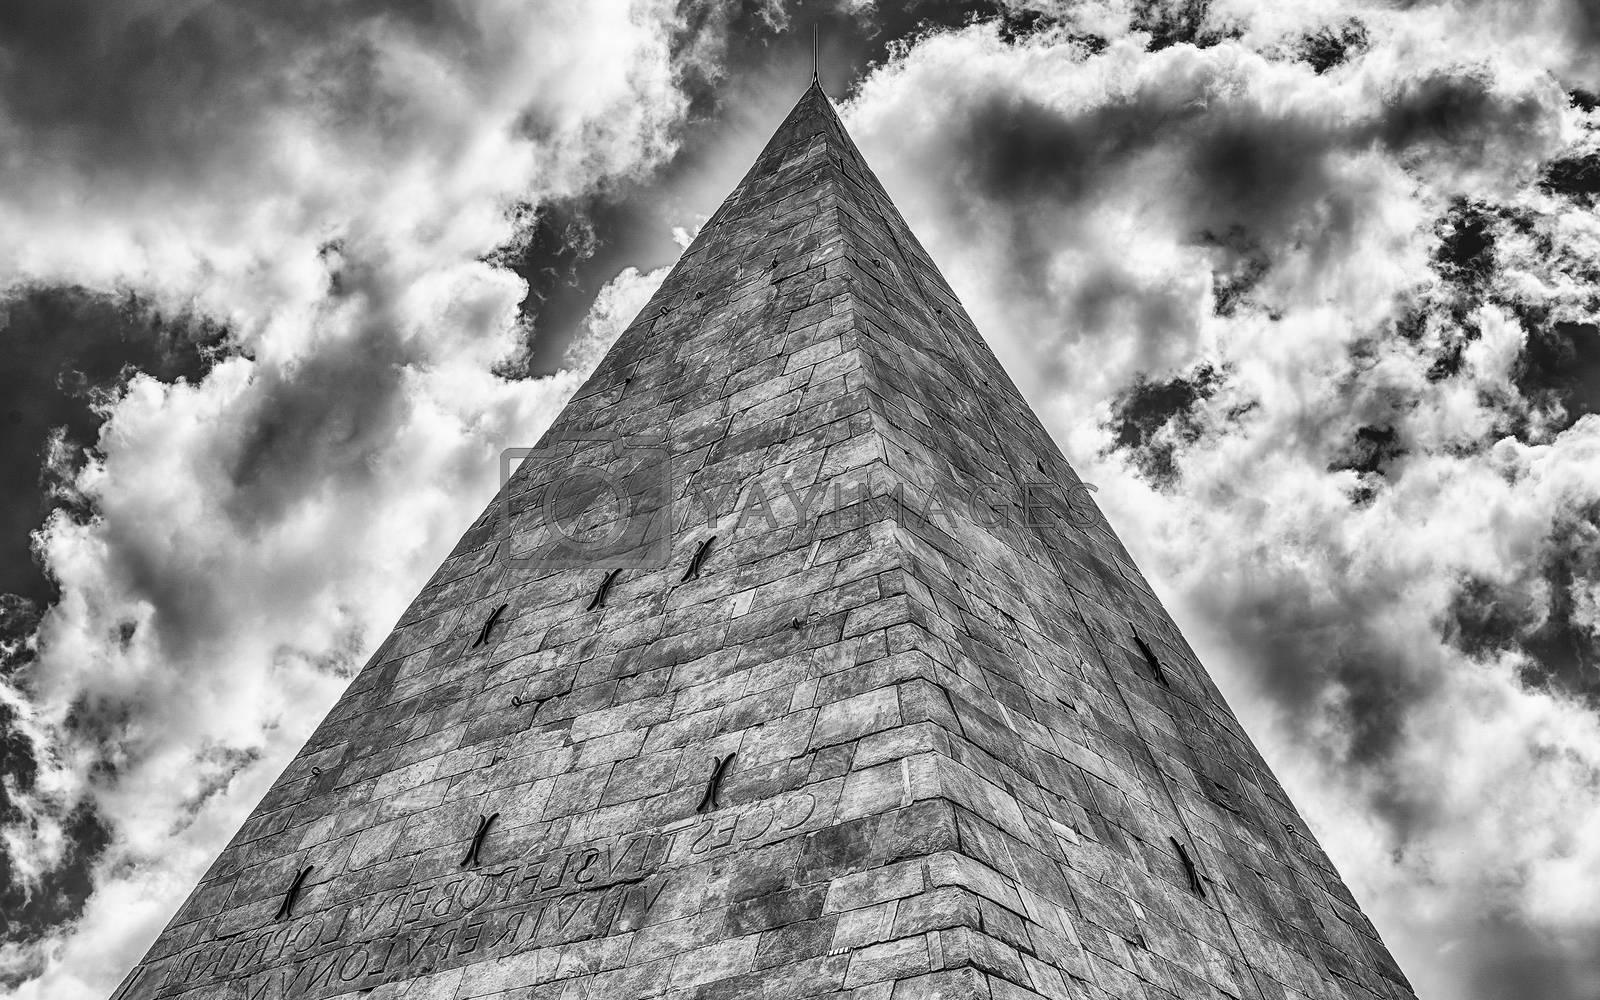 Scenic view of the Pyramid of Cestius, iconic landmark in Testaccio district in Rome, Italy